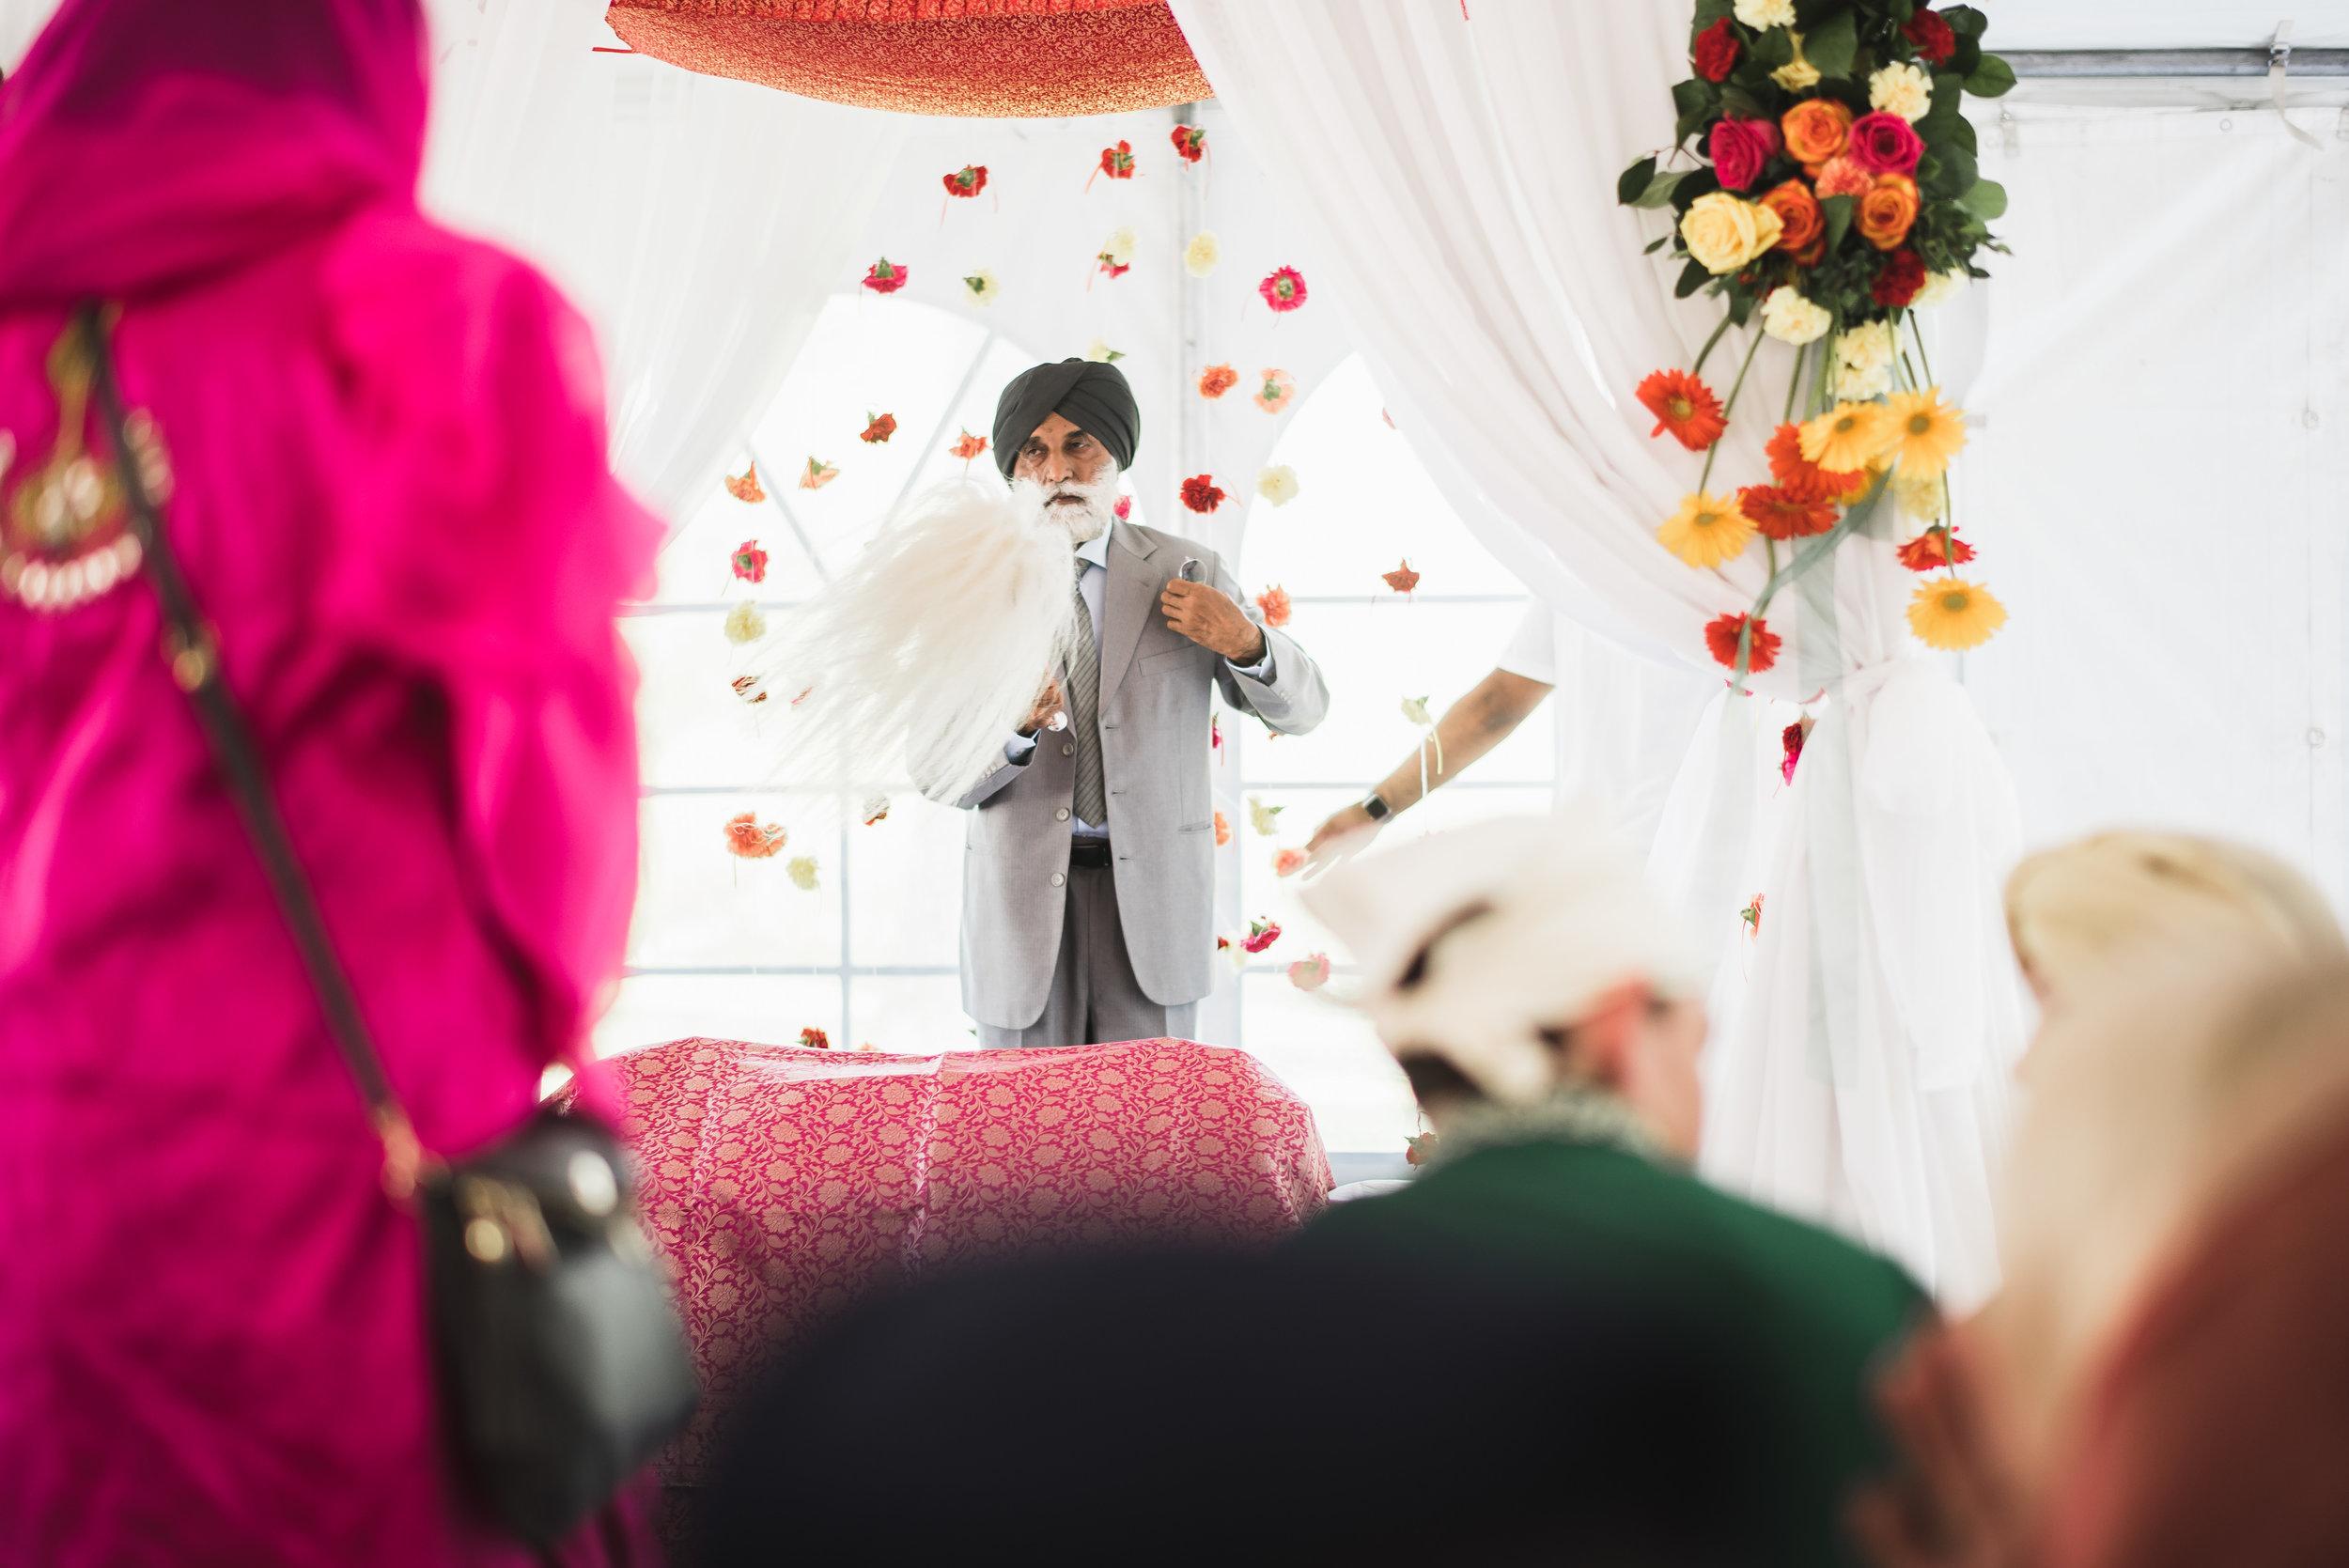 sophia_christopher_wedding_bw_2018_by_lucas_botz_photography_L75_7744.jpg